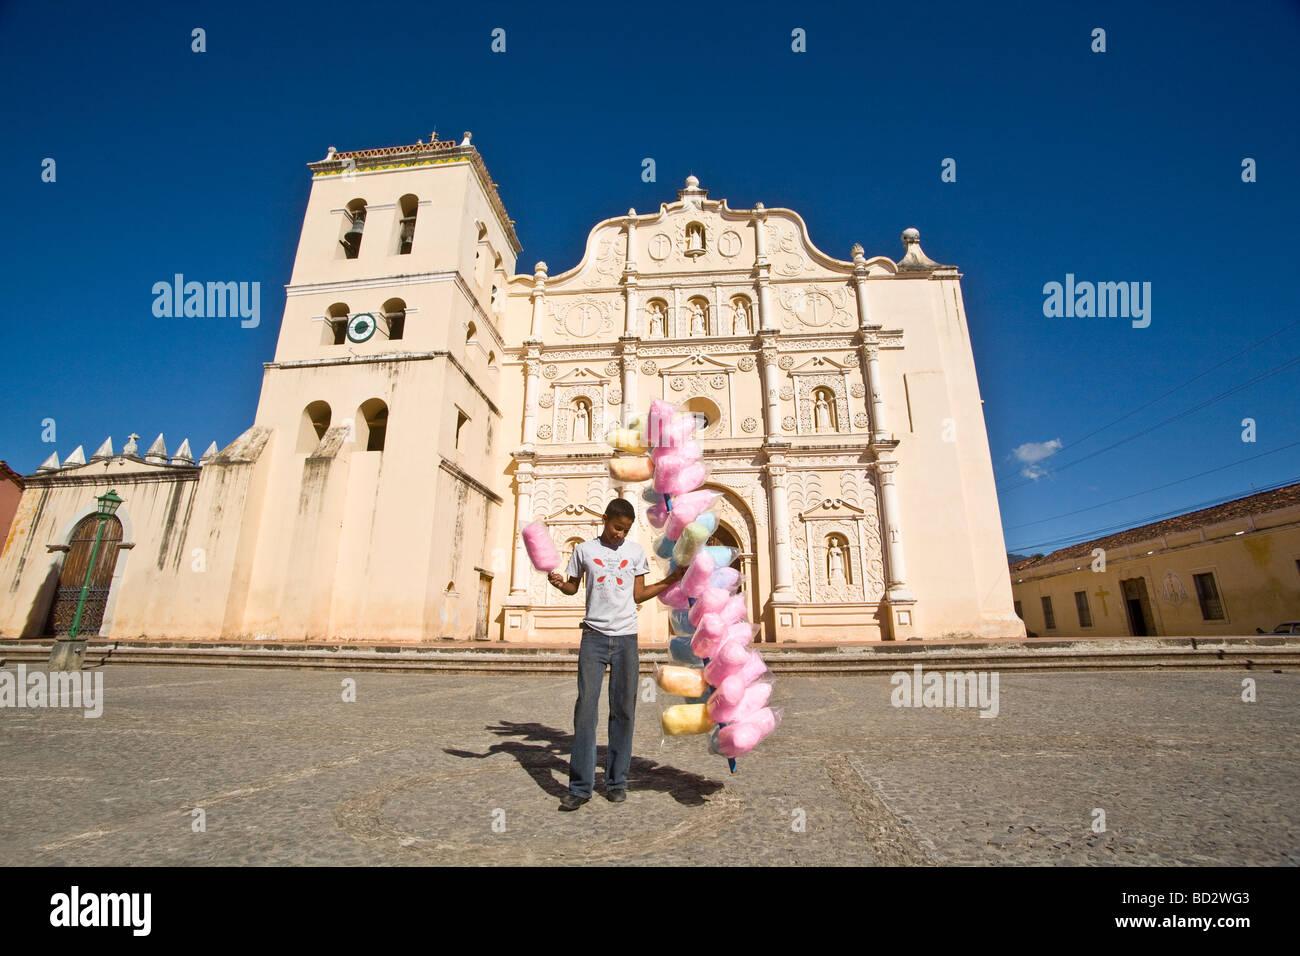 Cathedral of Comayagua, Honduras - Stock Image